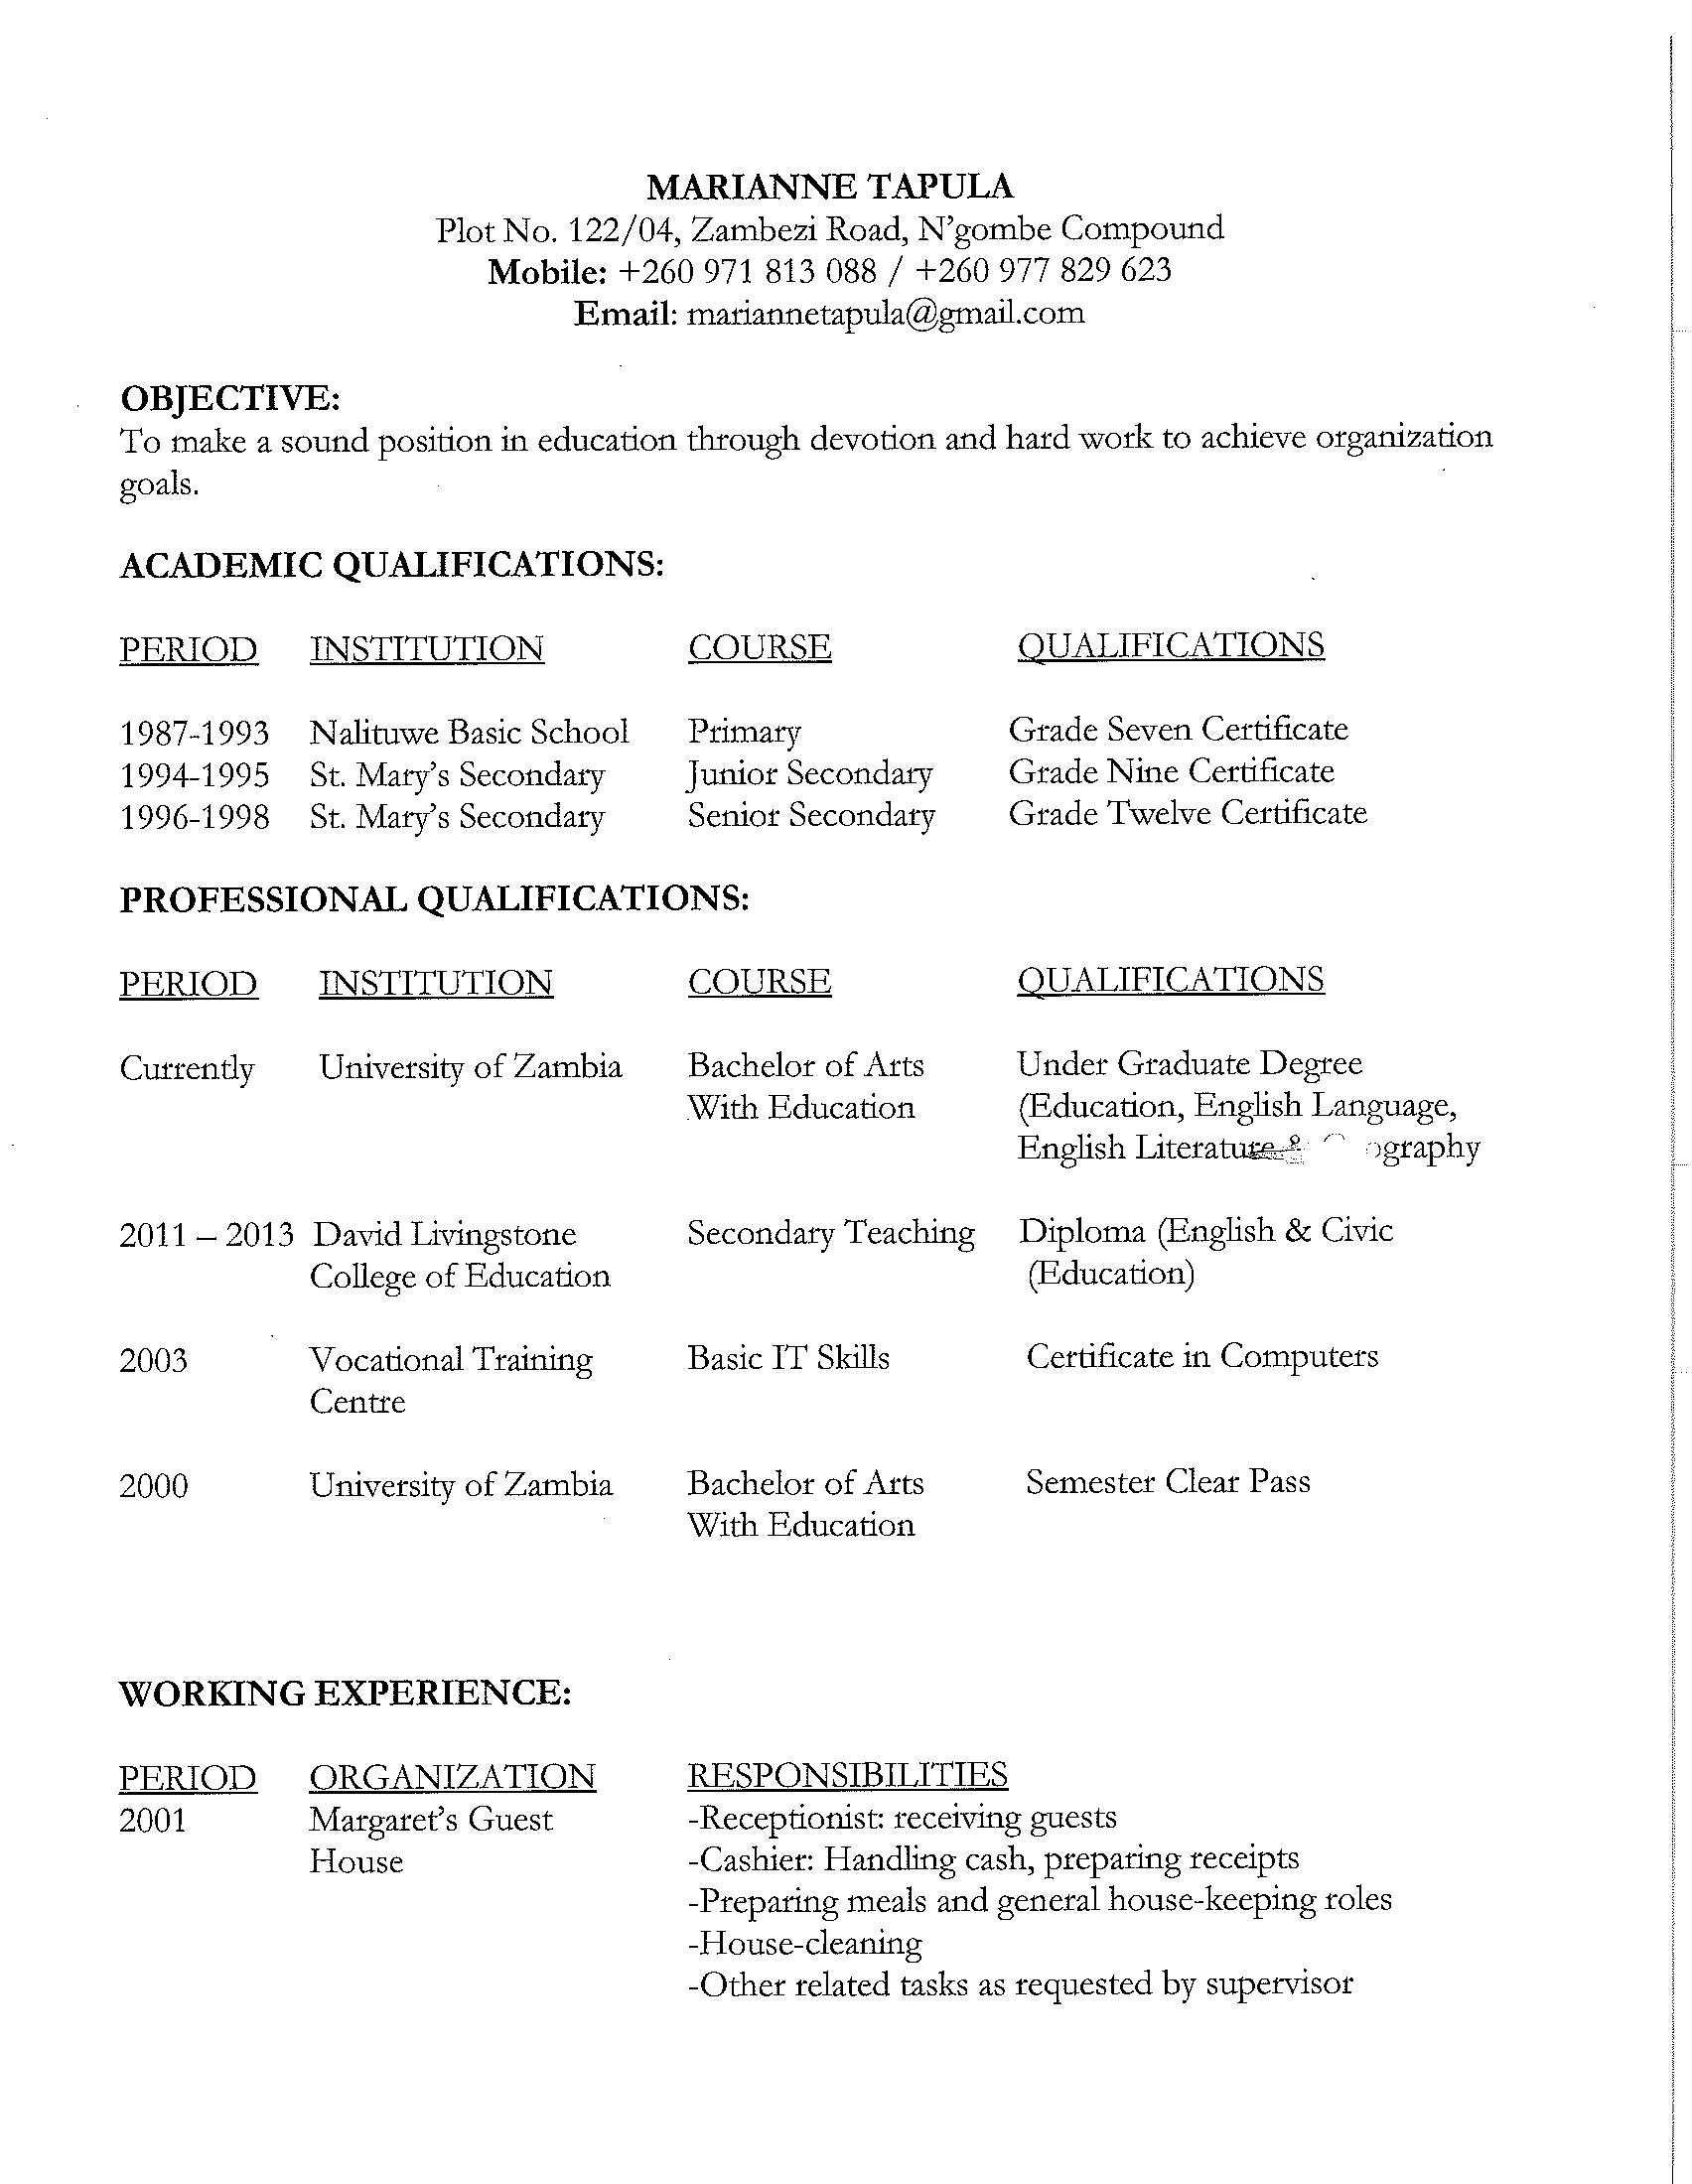 Secondary School Teaching (English & Civic Education)